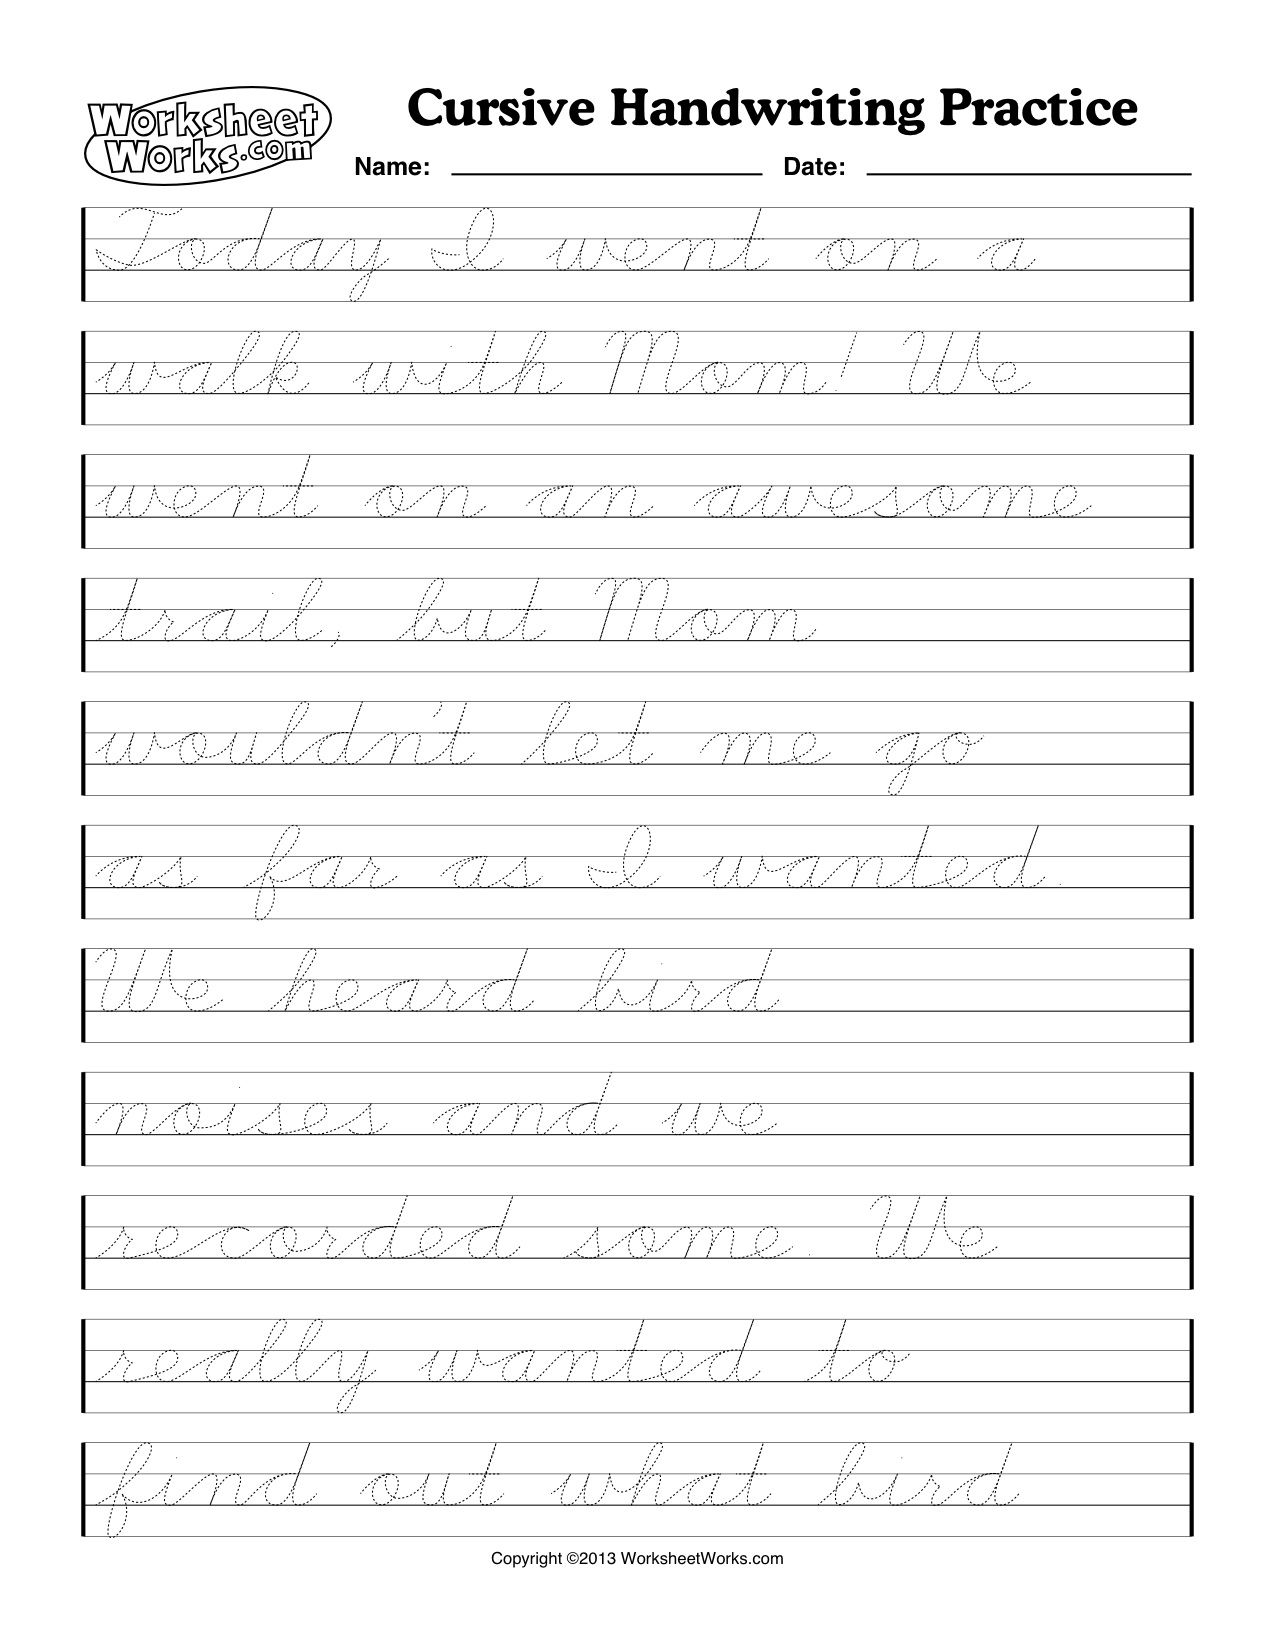 Download Cursive Writing Worksheets [ 1651 x 1275 Pixel ]